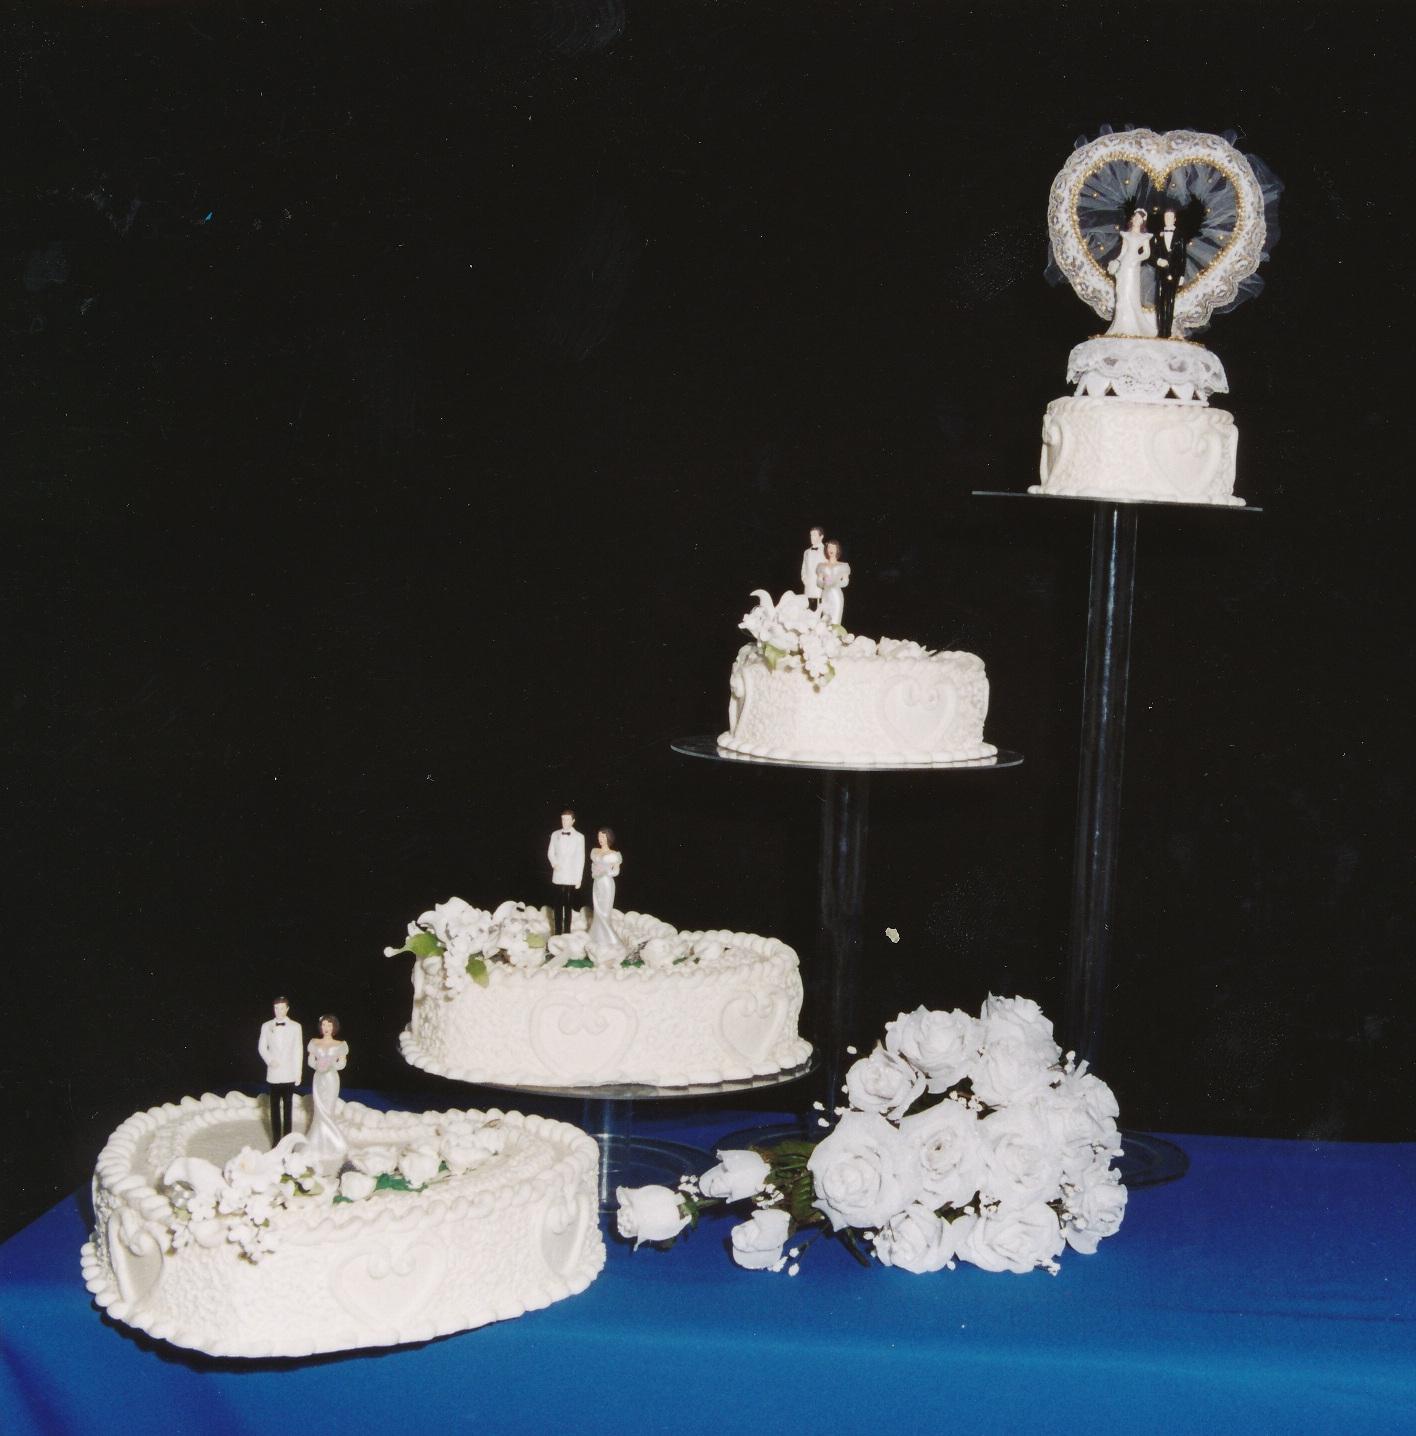 16 May 2010 Wedding Cakes 59 Wedding Cakes Wedding Cakes